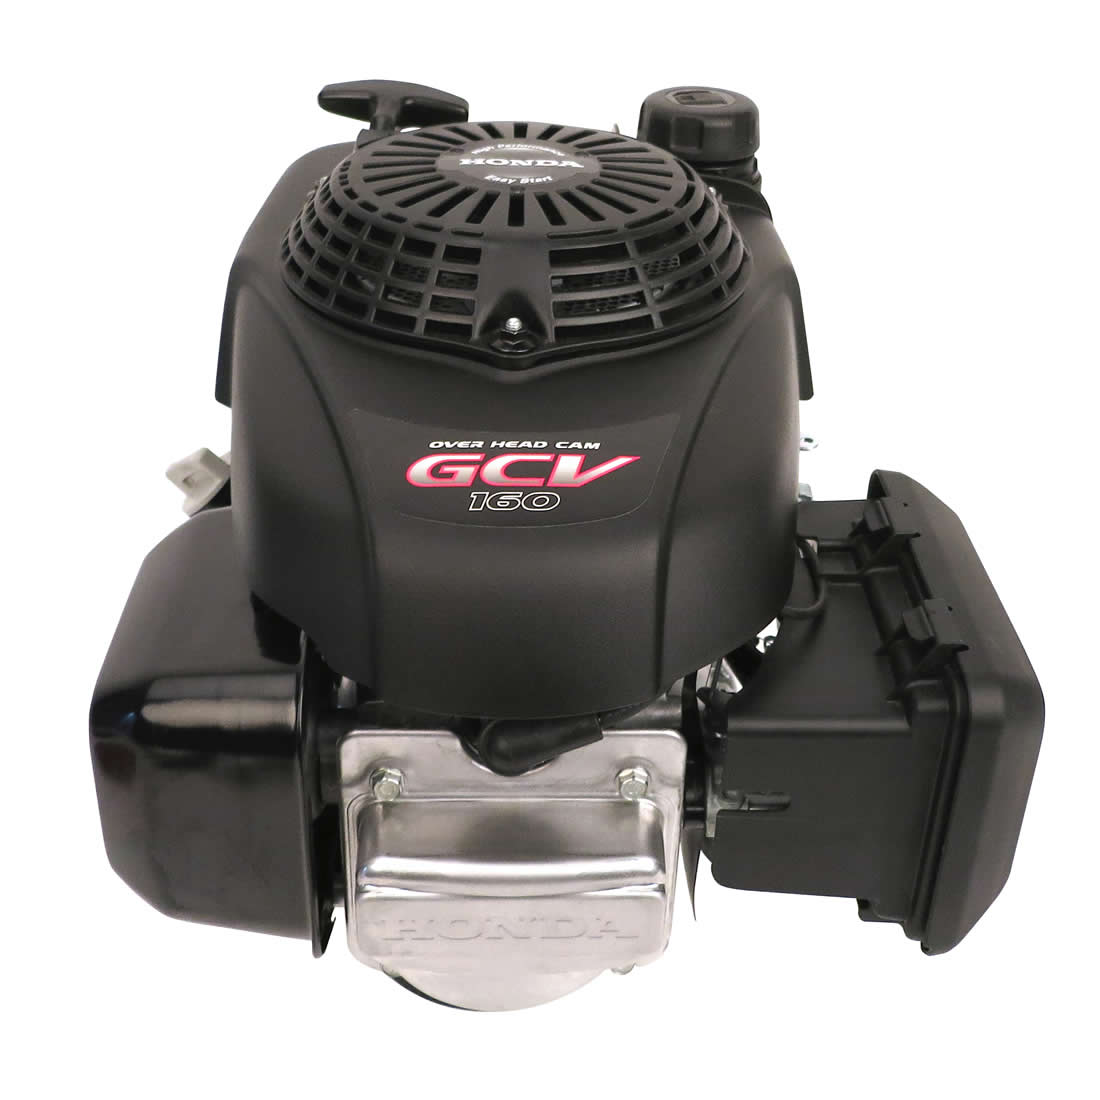 Honda Engines | GCV160 4-Stroke Engine | Features, Specs